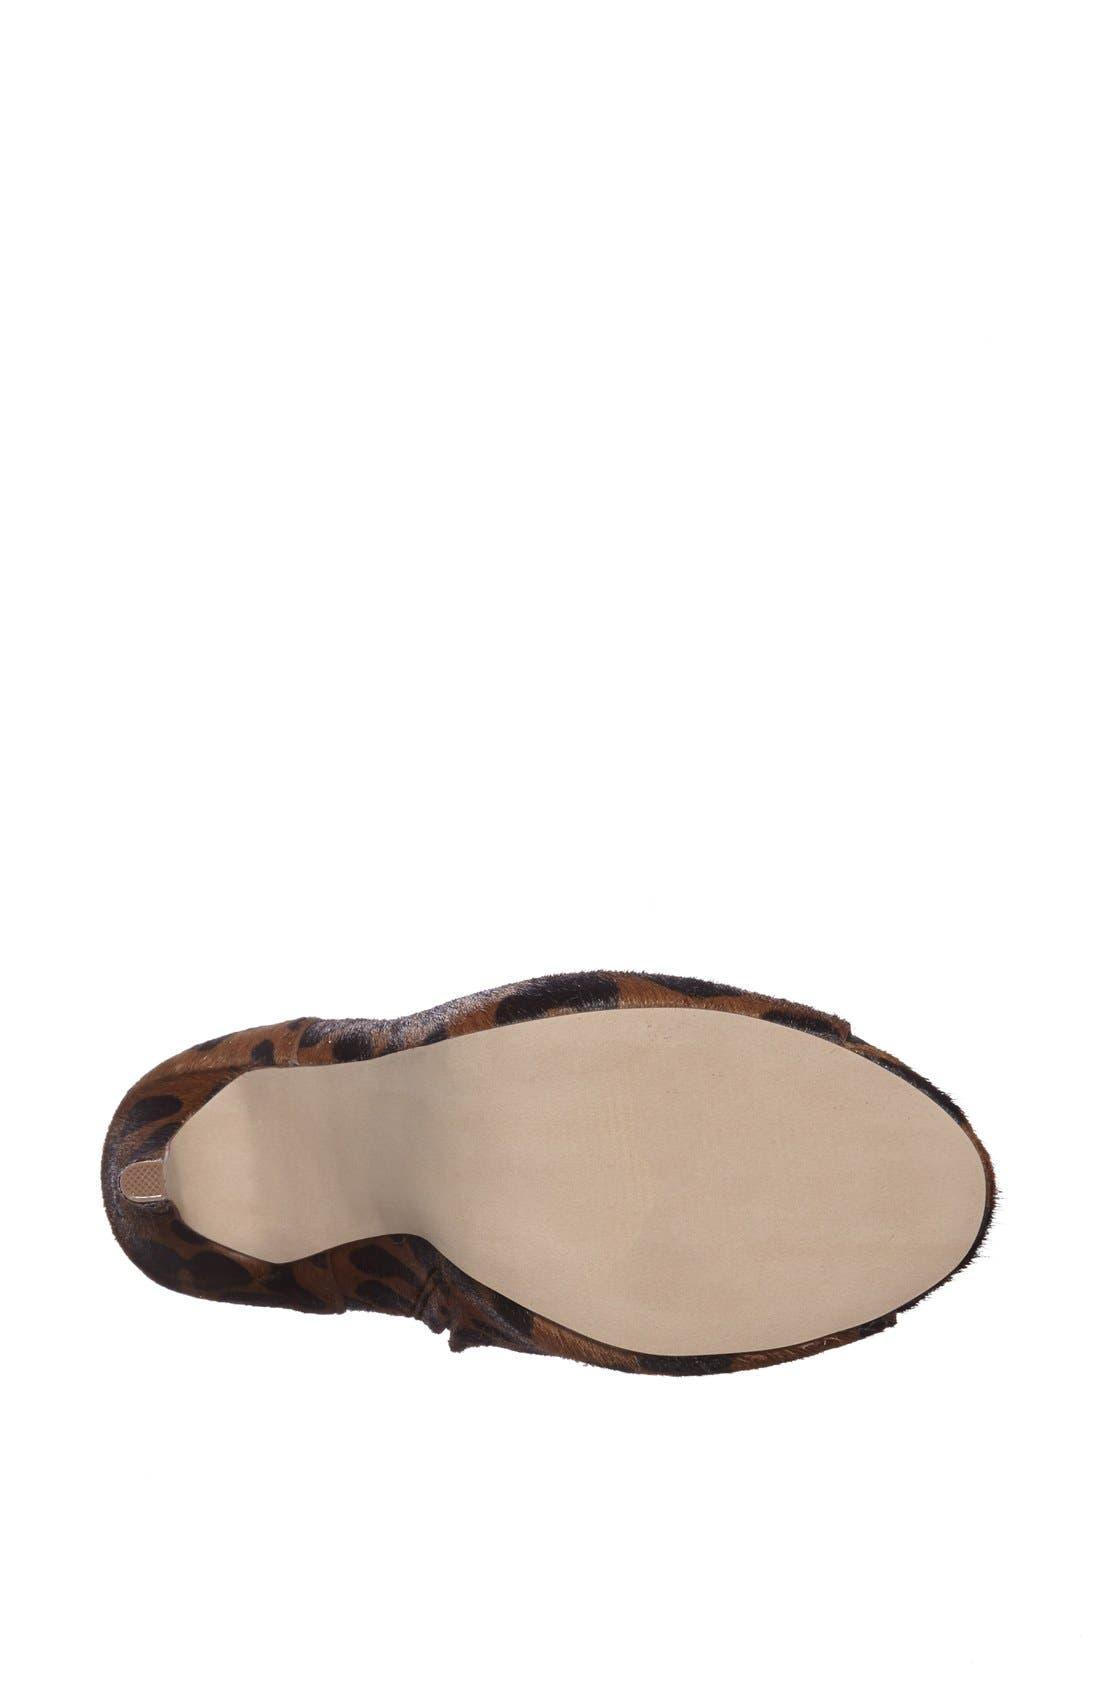 Alternate Image 4  - The Blonde Salad x Steve Madden 'Milan' Leopard Print Calf Hair Peep Toe Bootie